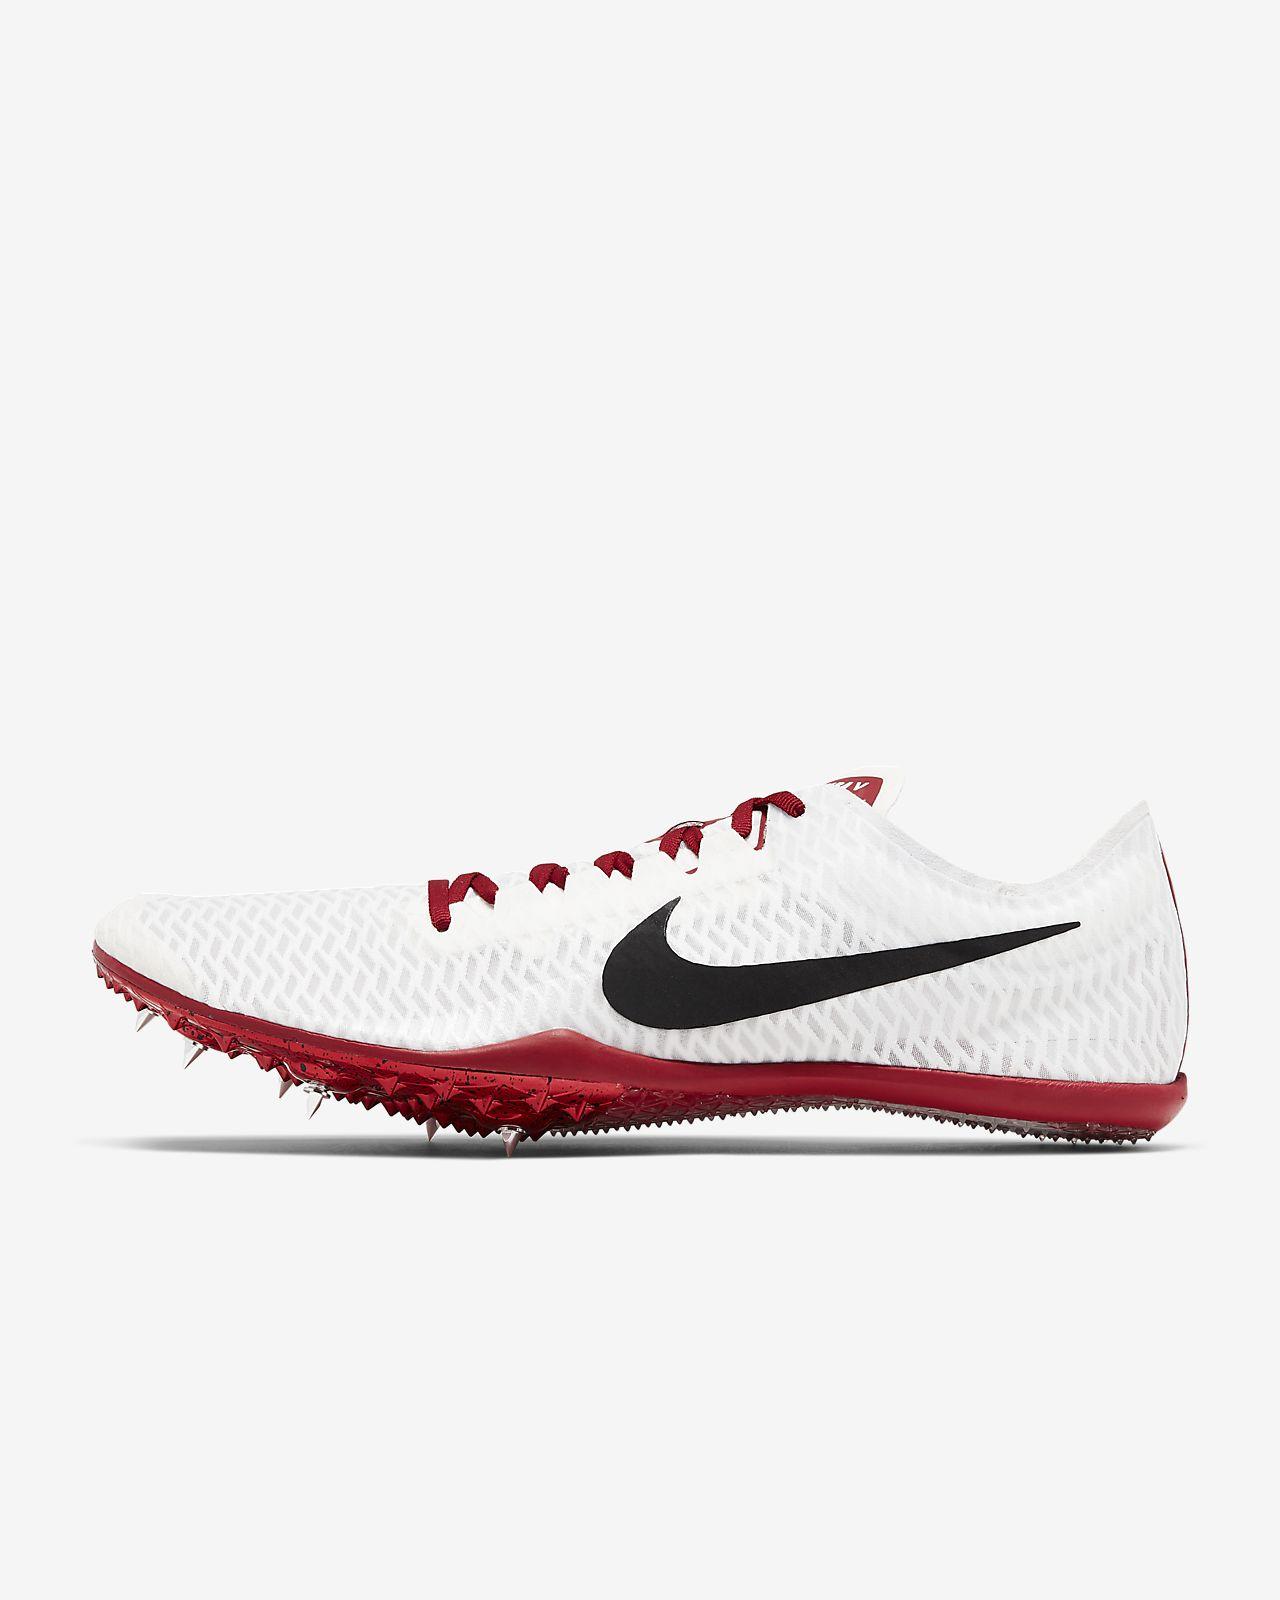 Nike Zoom Mamba 5 Bowerman Track Club løpesko